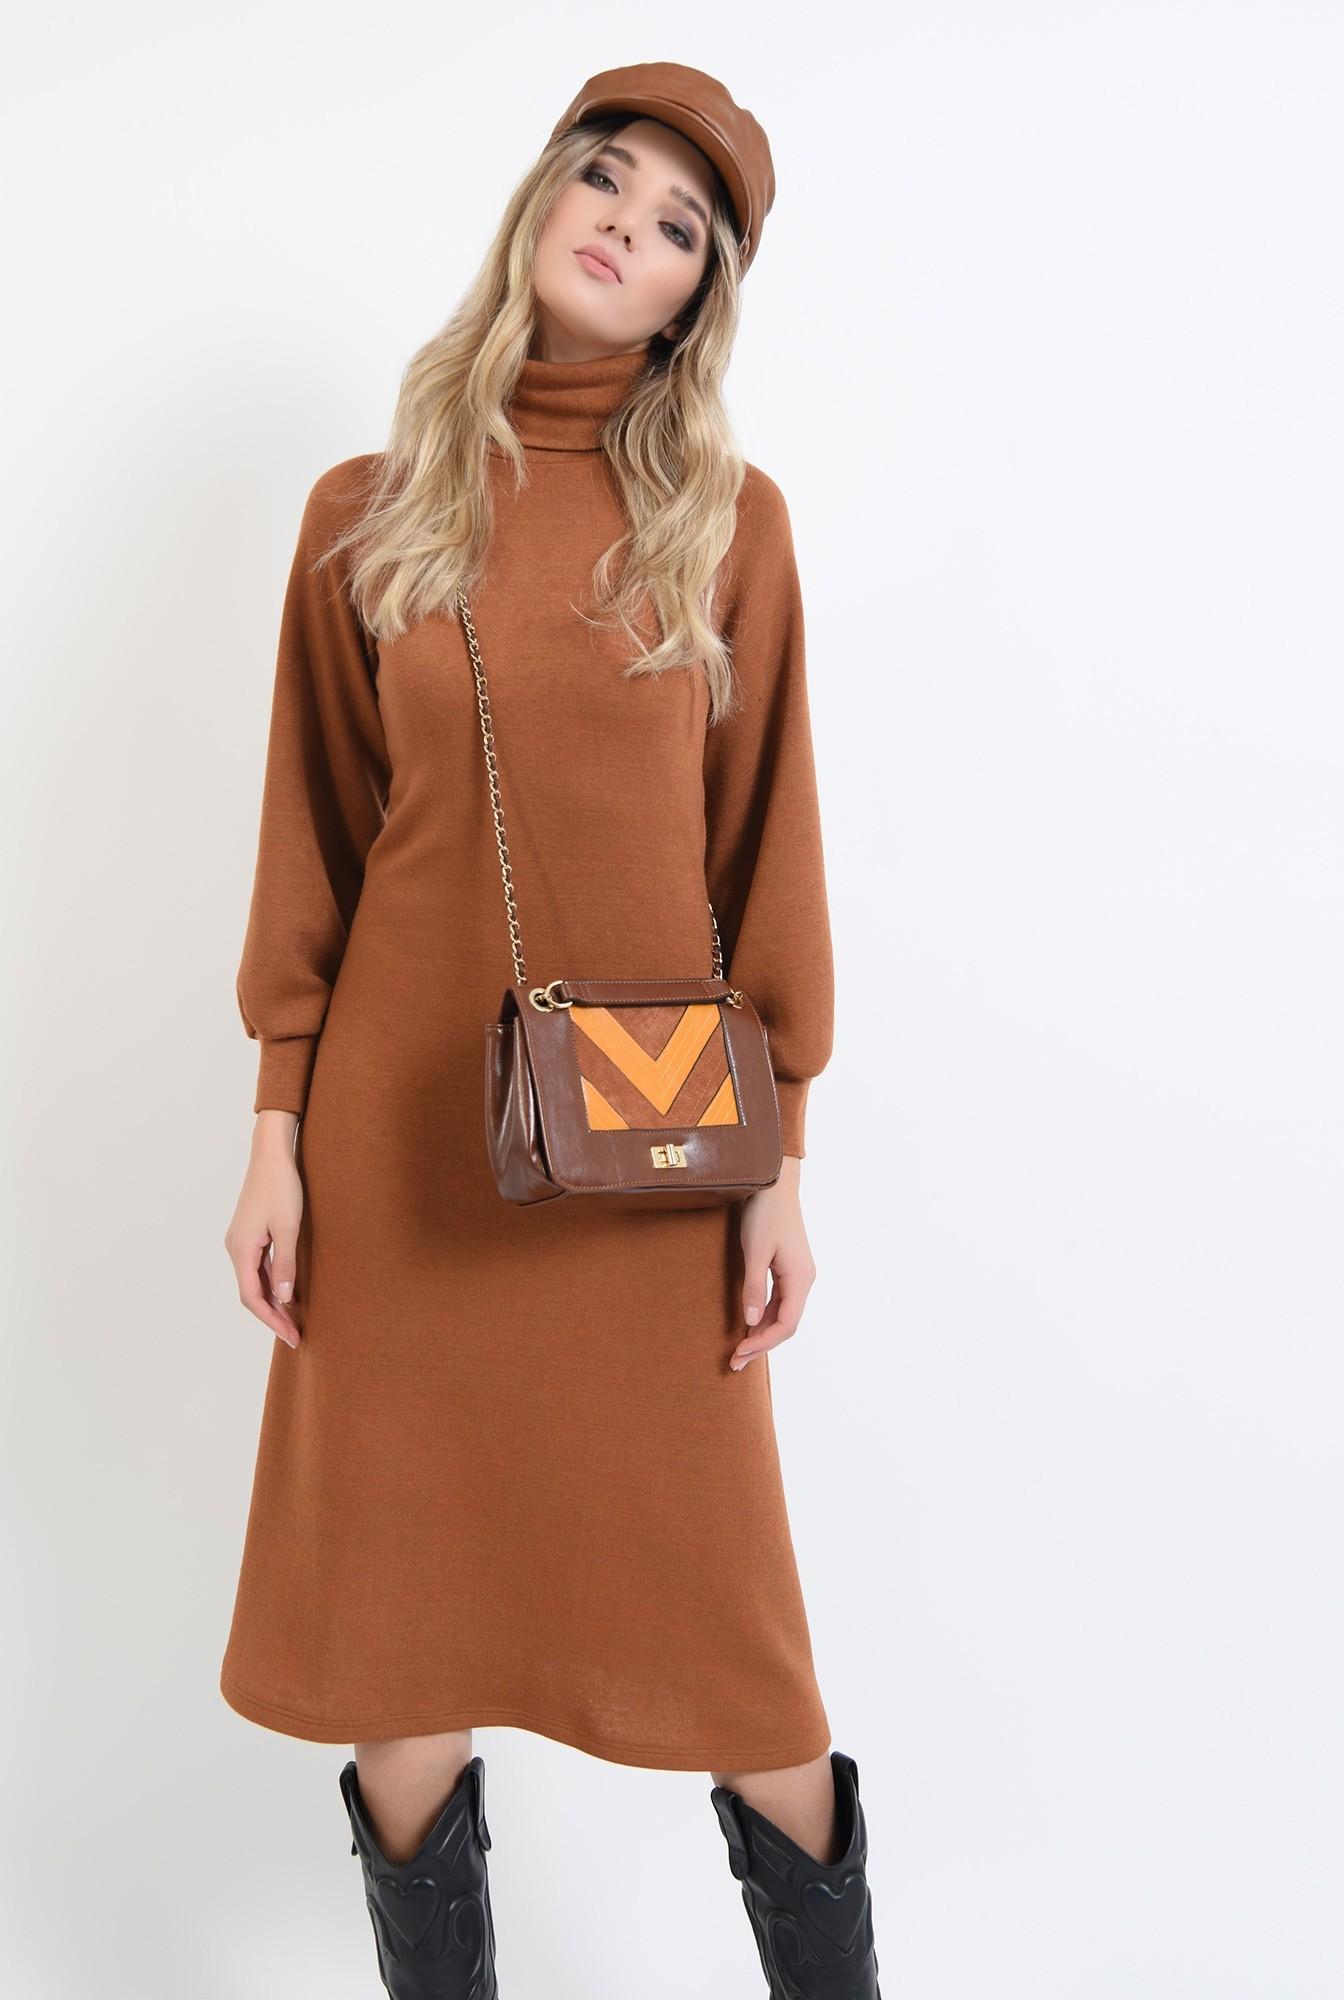 0 - 360 - rochie midi, evazata, din tricot, cu maneca bufanta